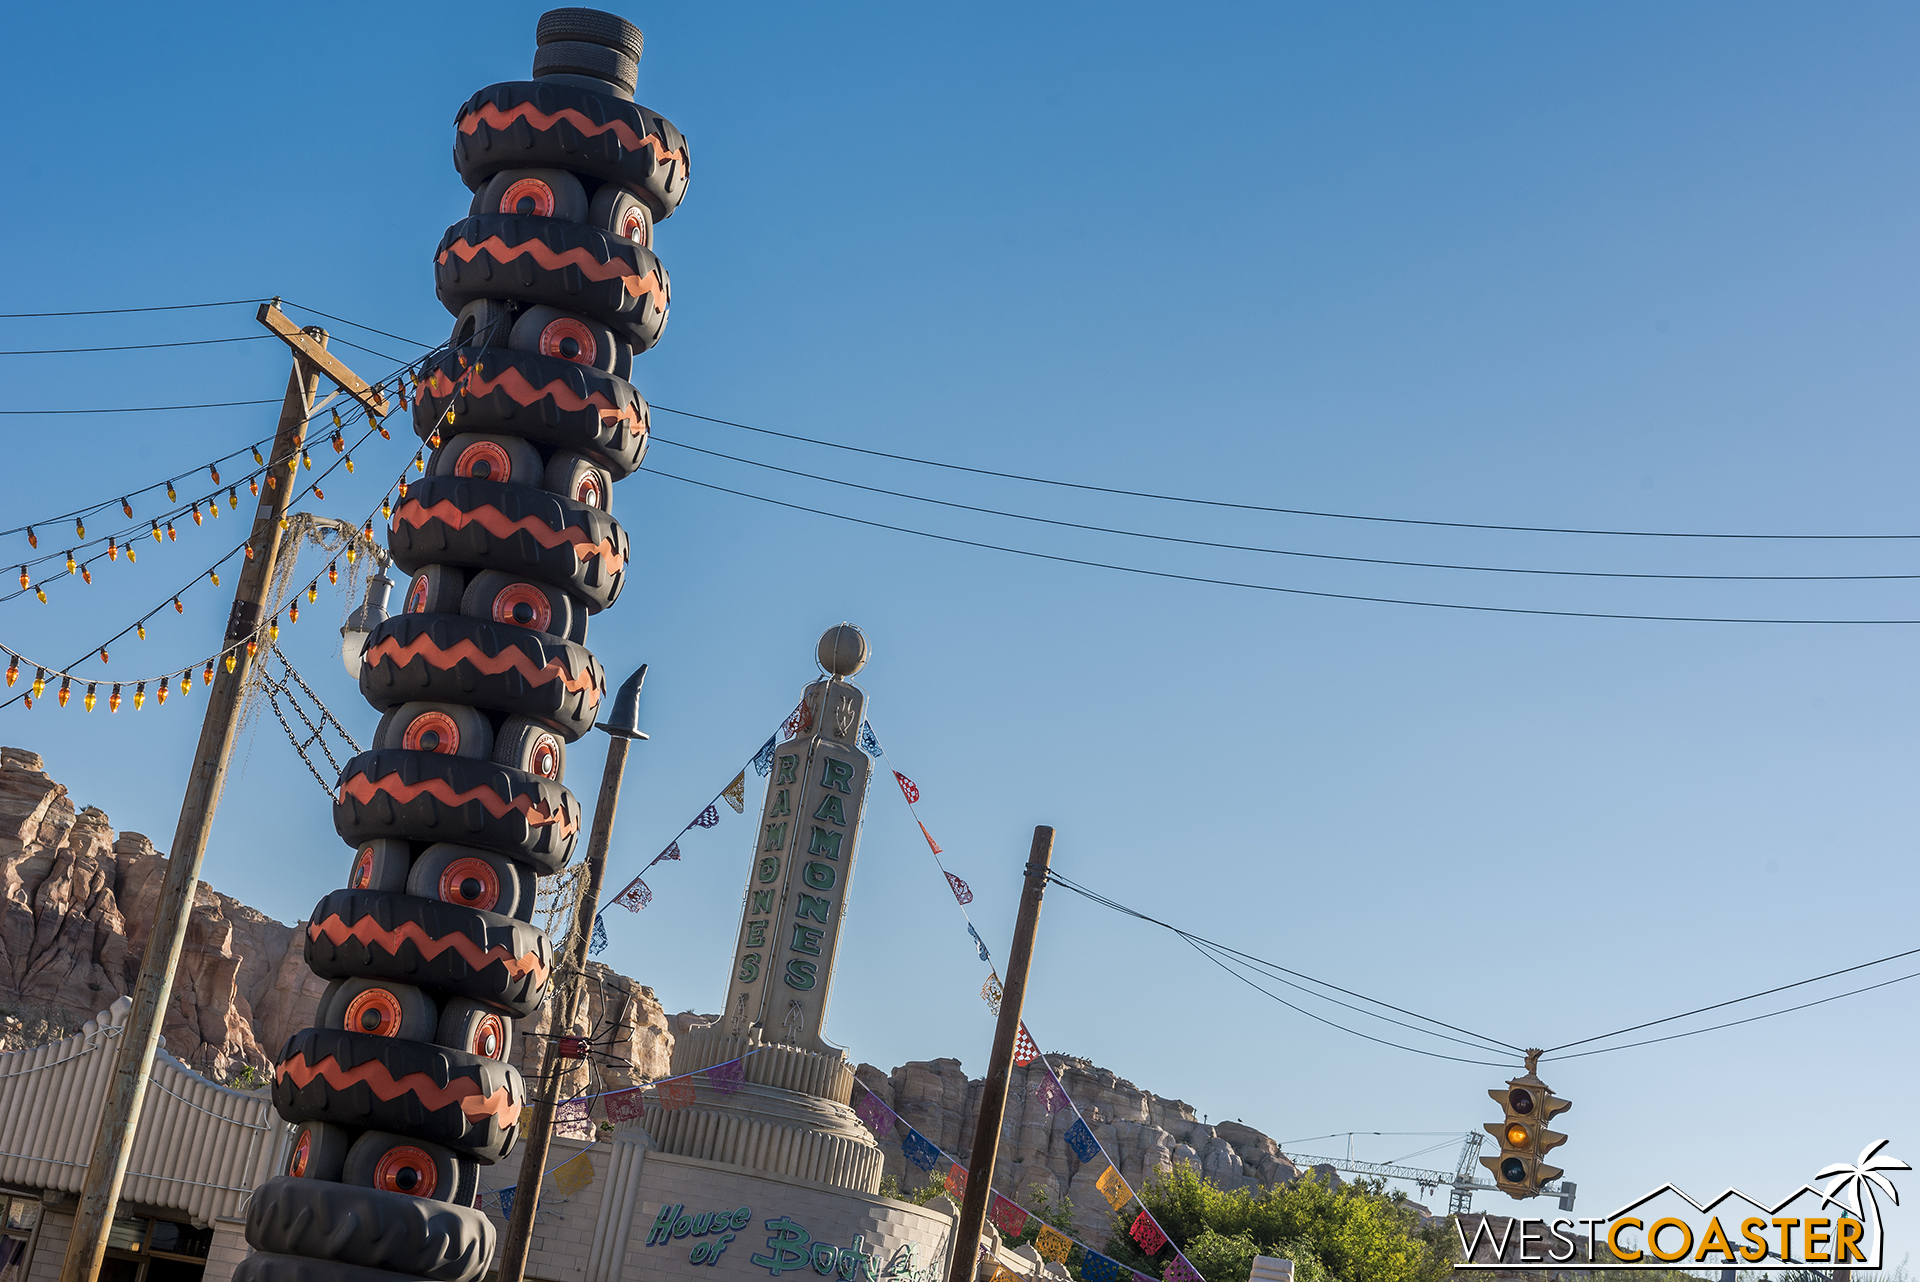 Luigi's leaning tower has a fall flair.